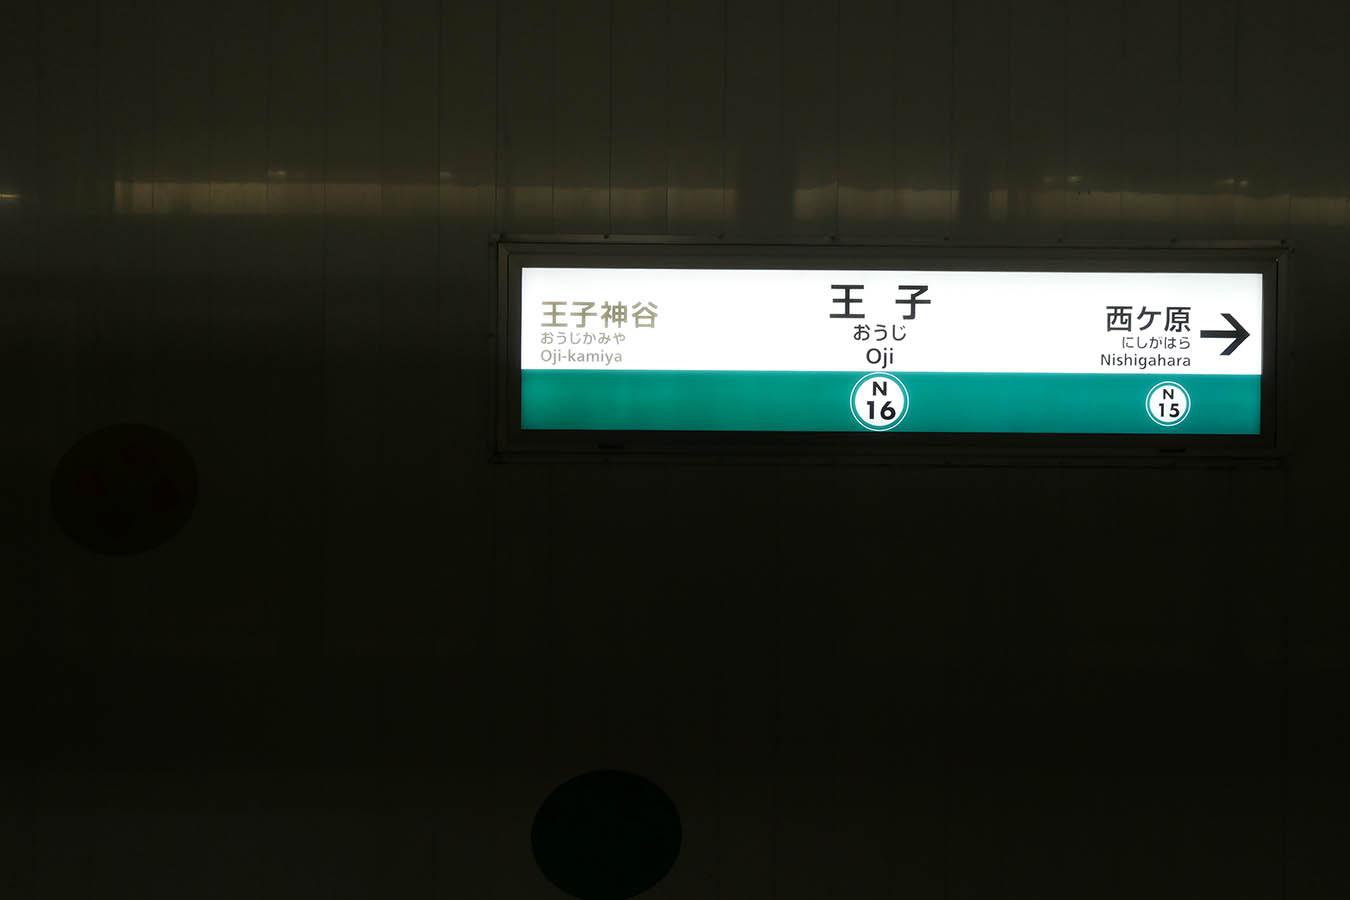 N16_photo03.jpg